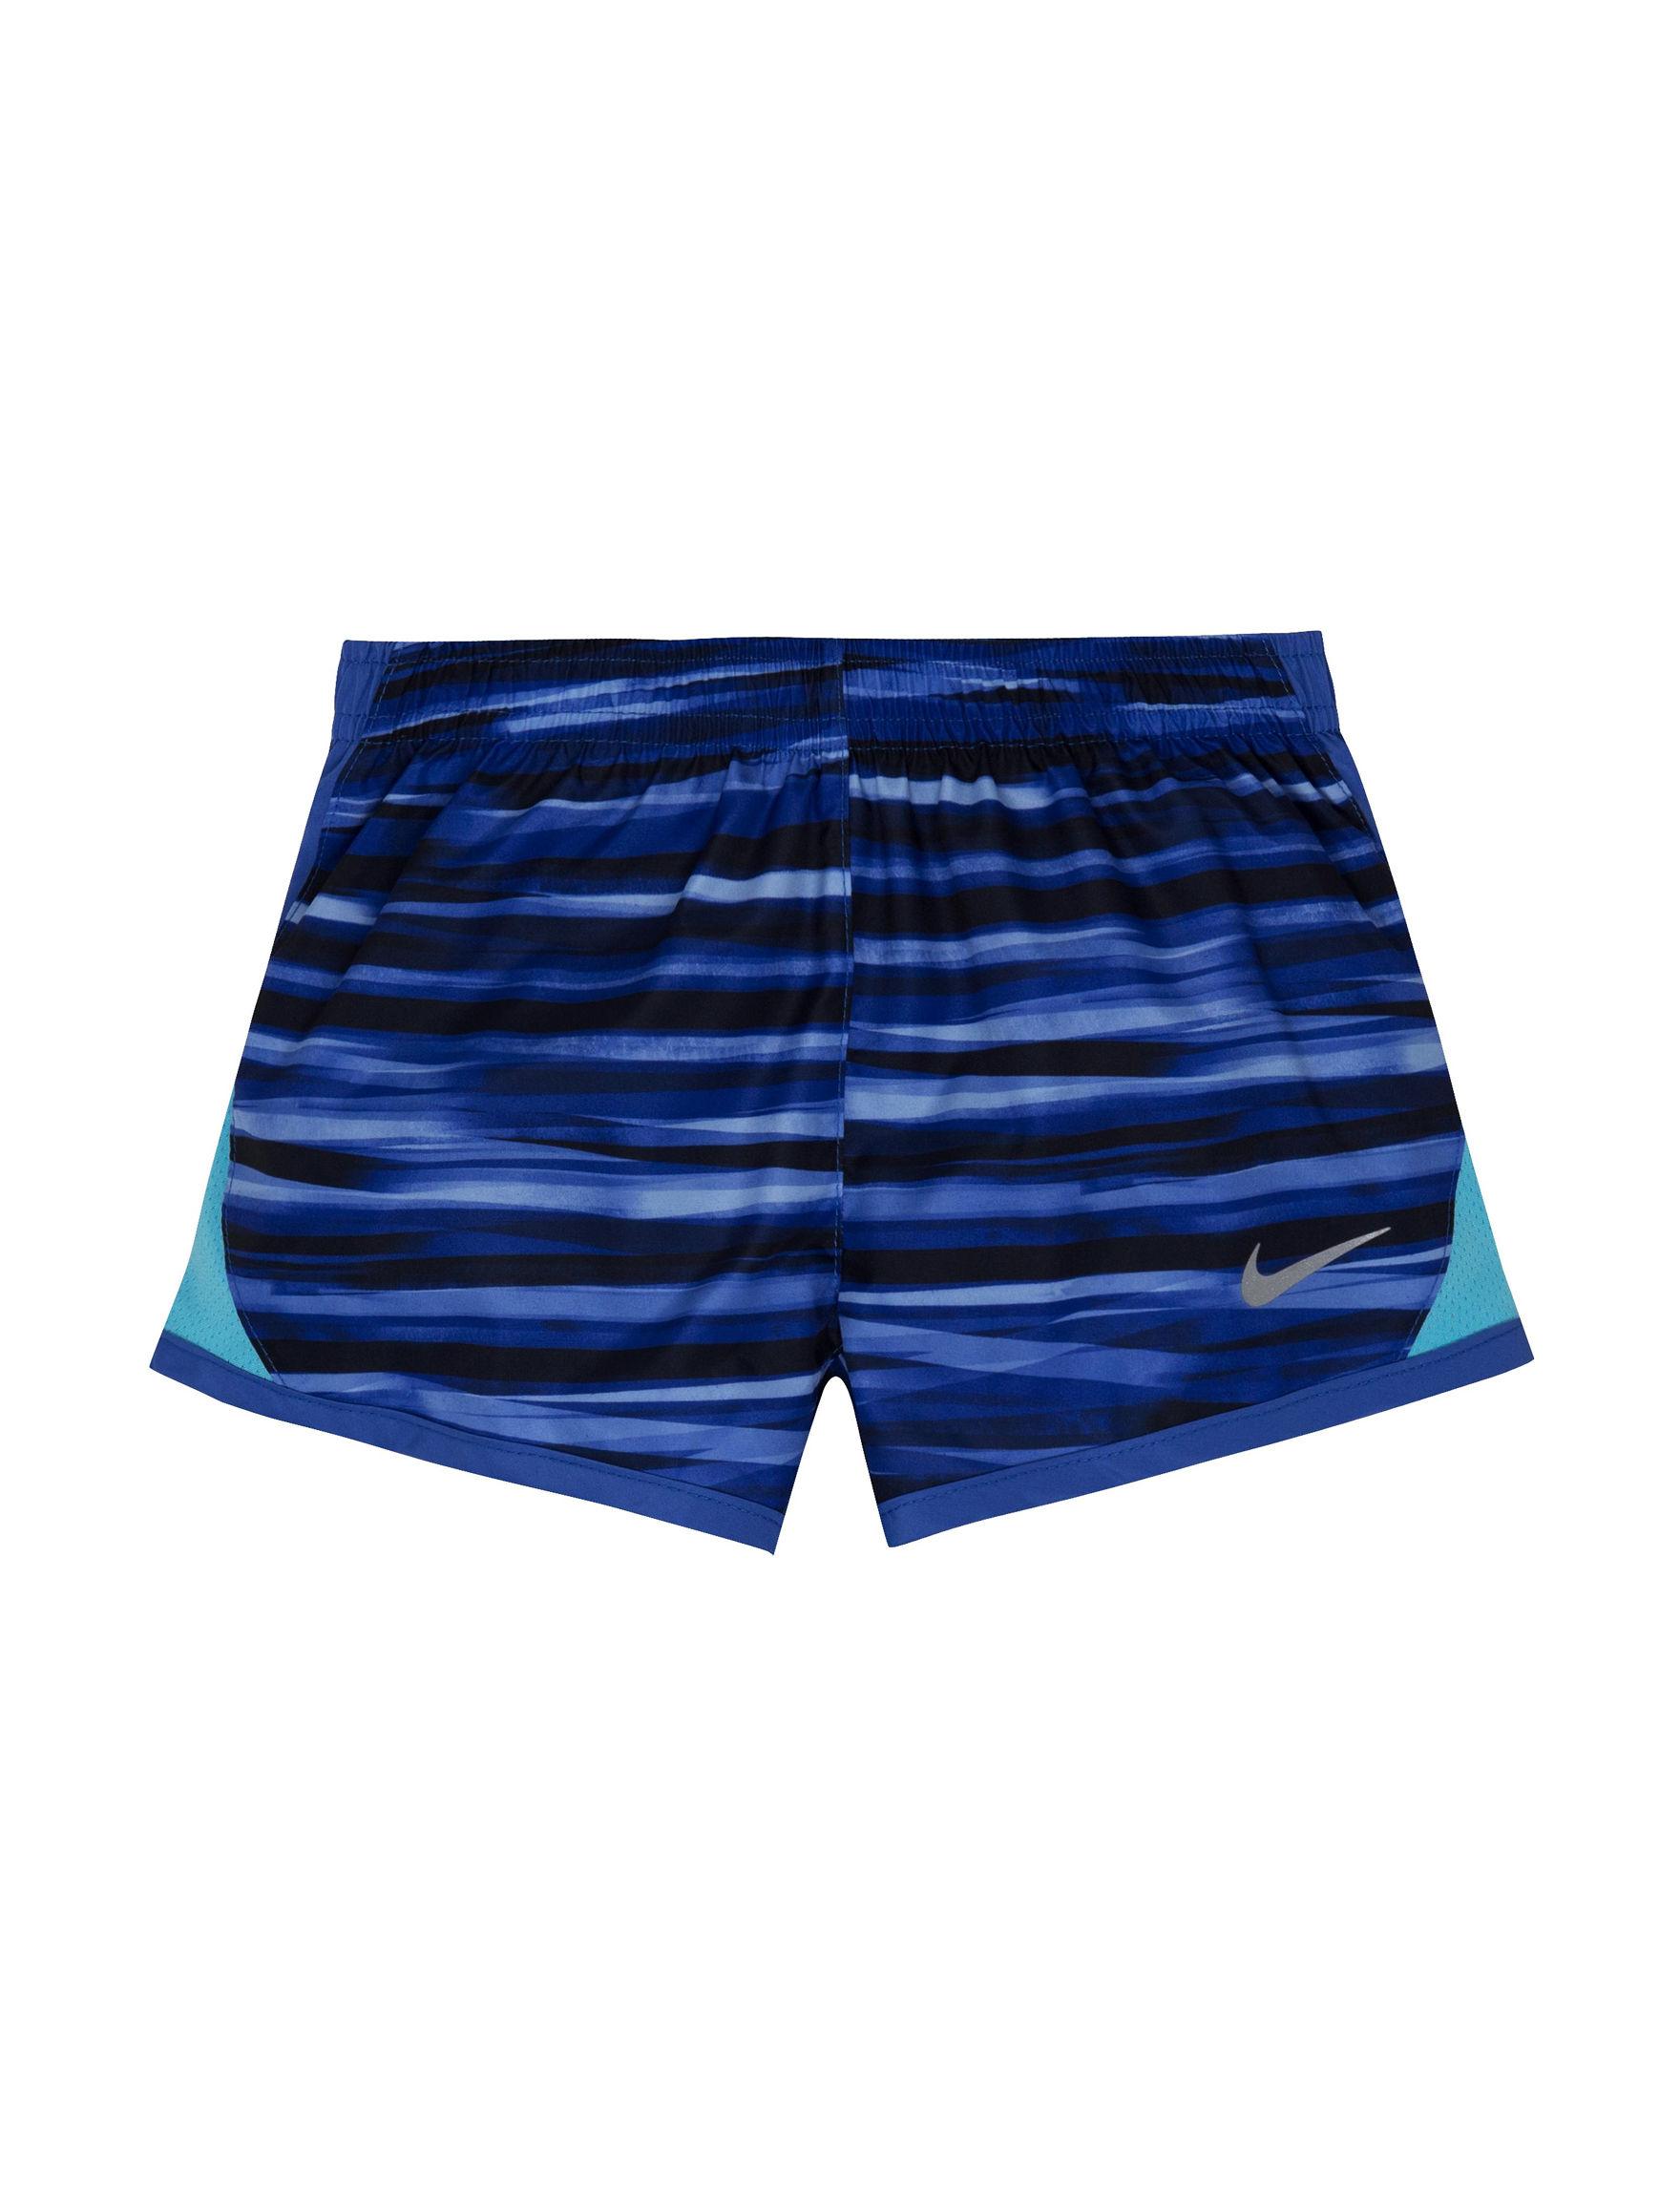 Nike Blue Loose